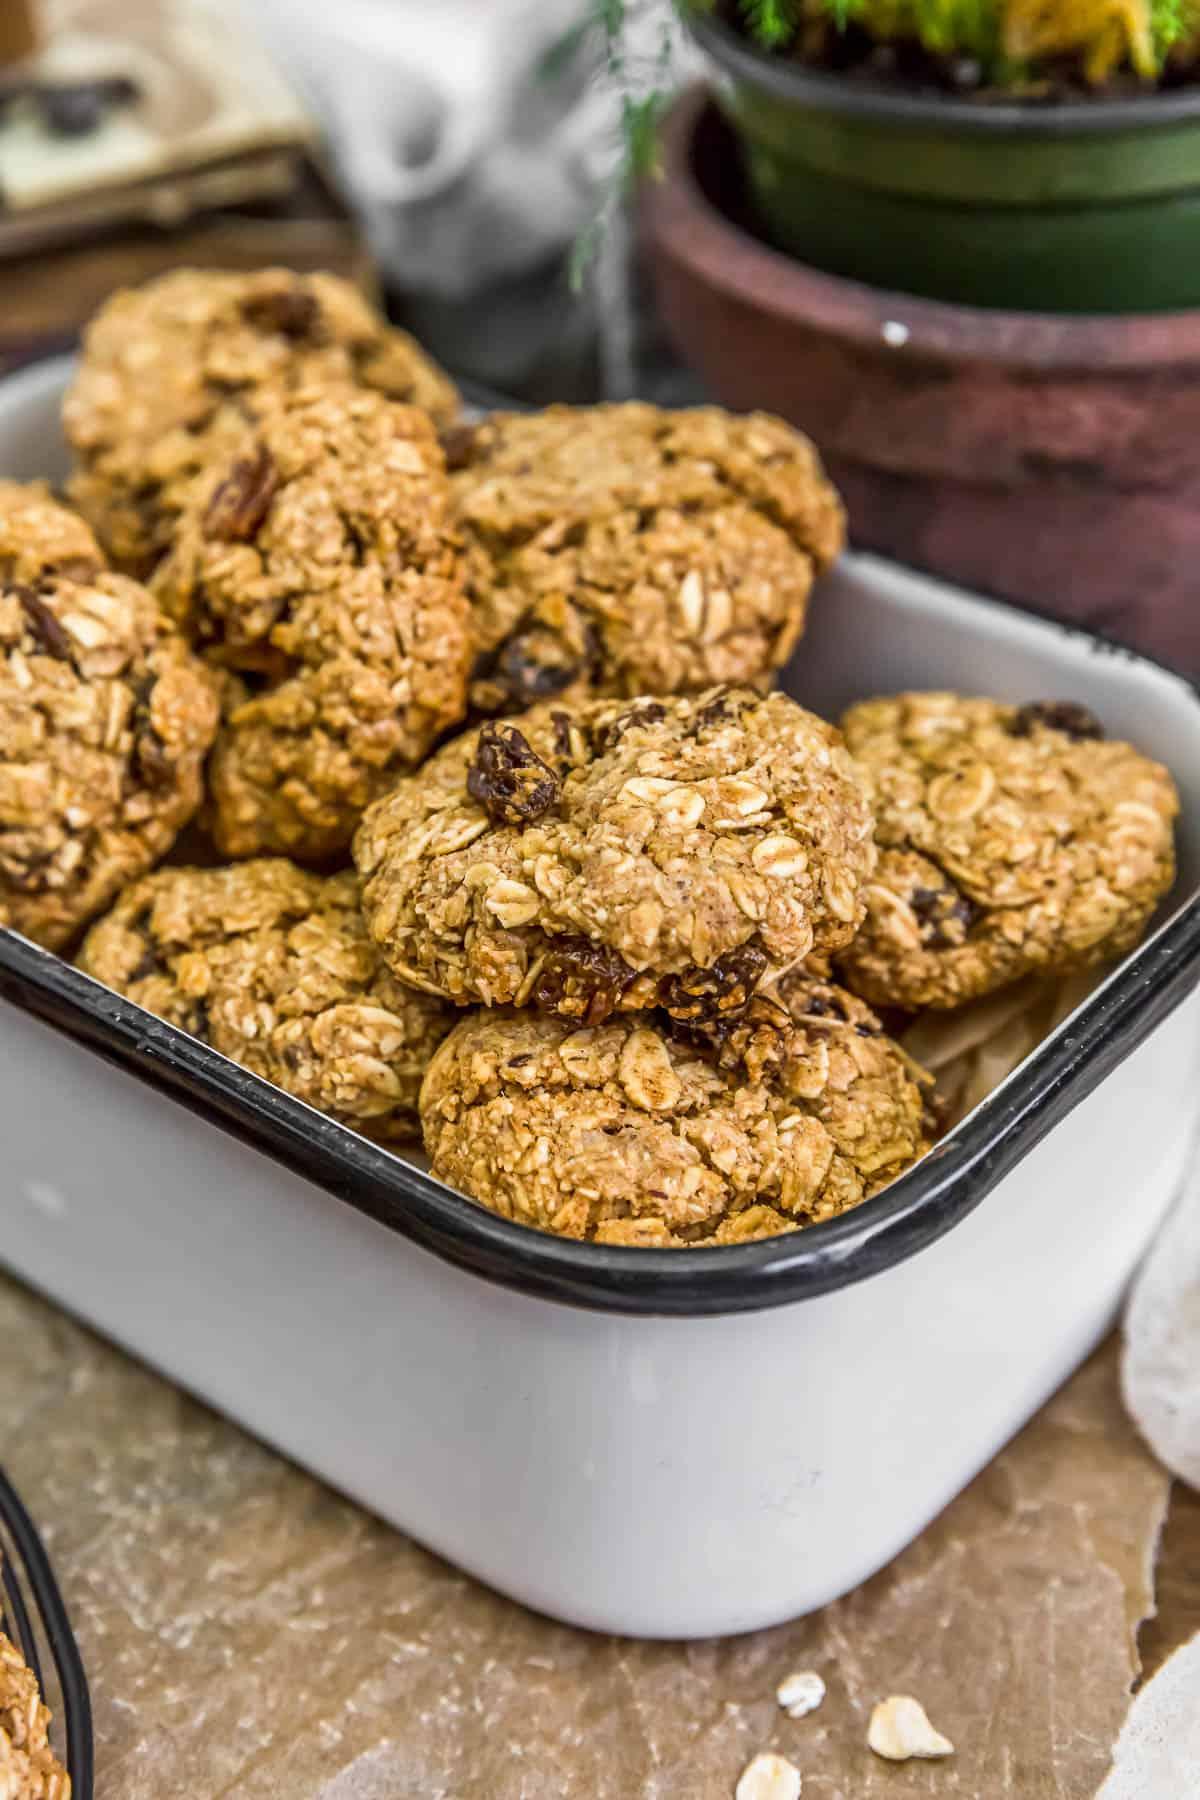 Tin of Vegan Crispy Oatmeal Cookies